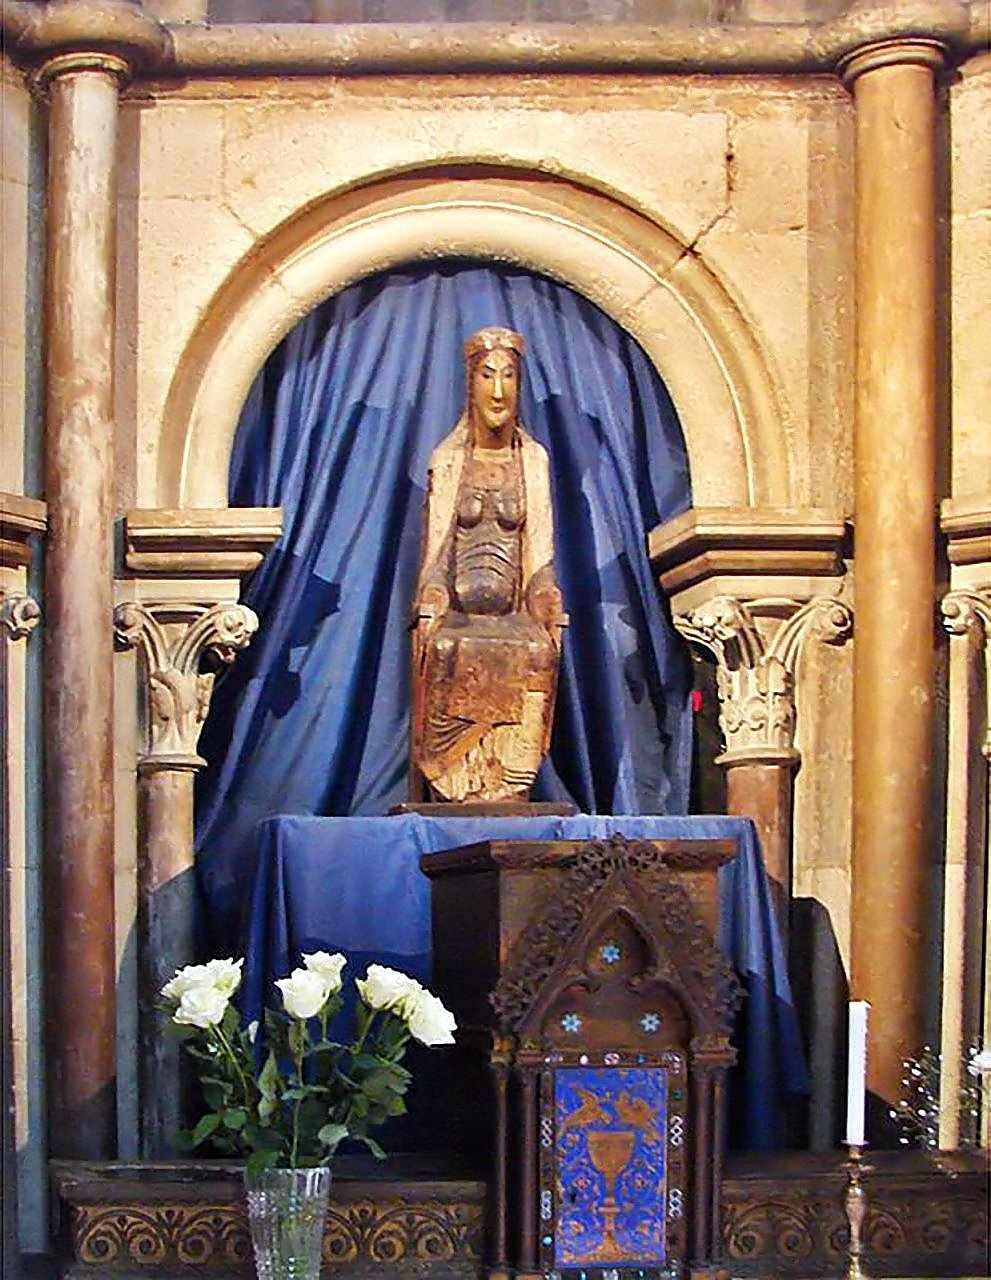 La Virgen Negra de la catedral de Dijon